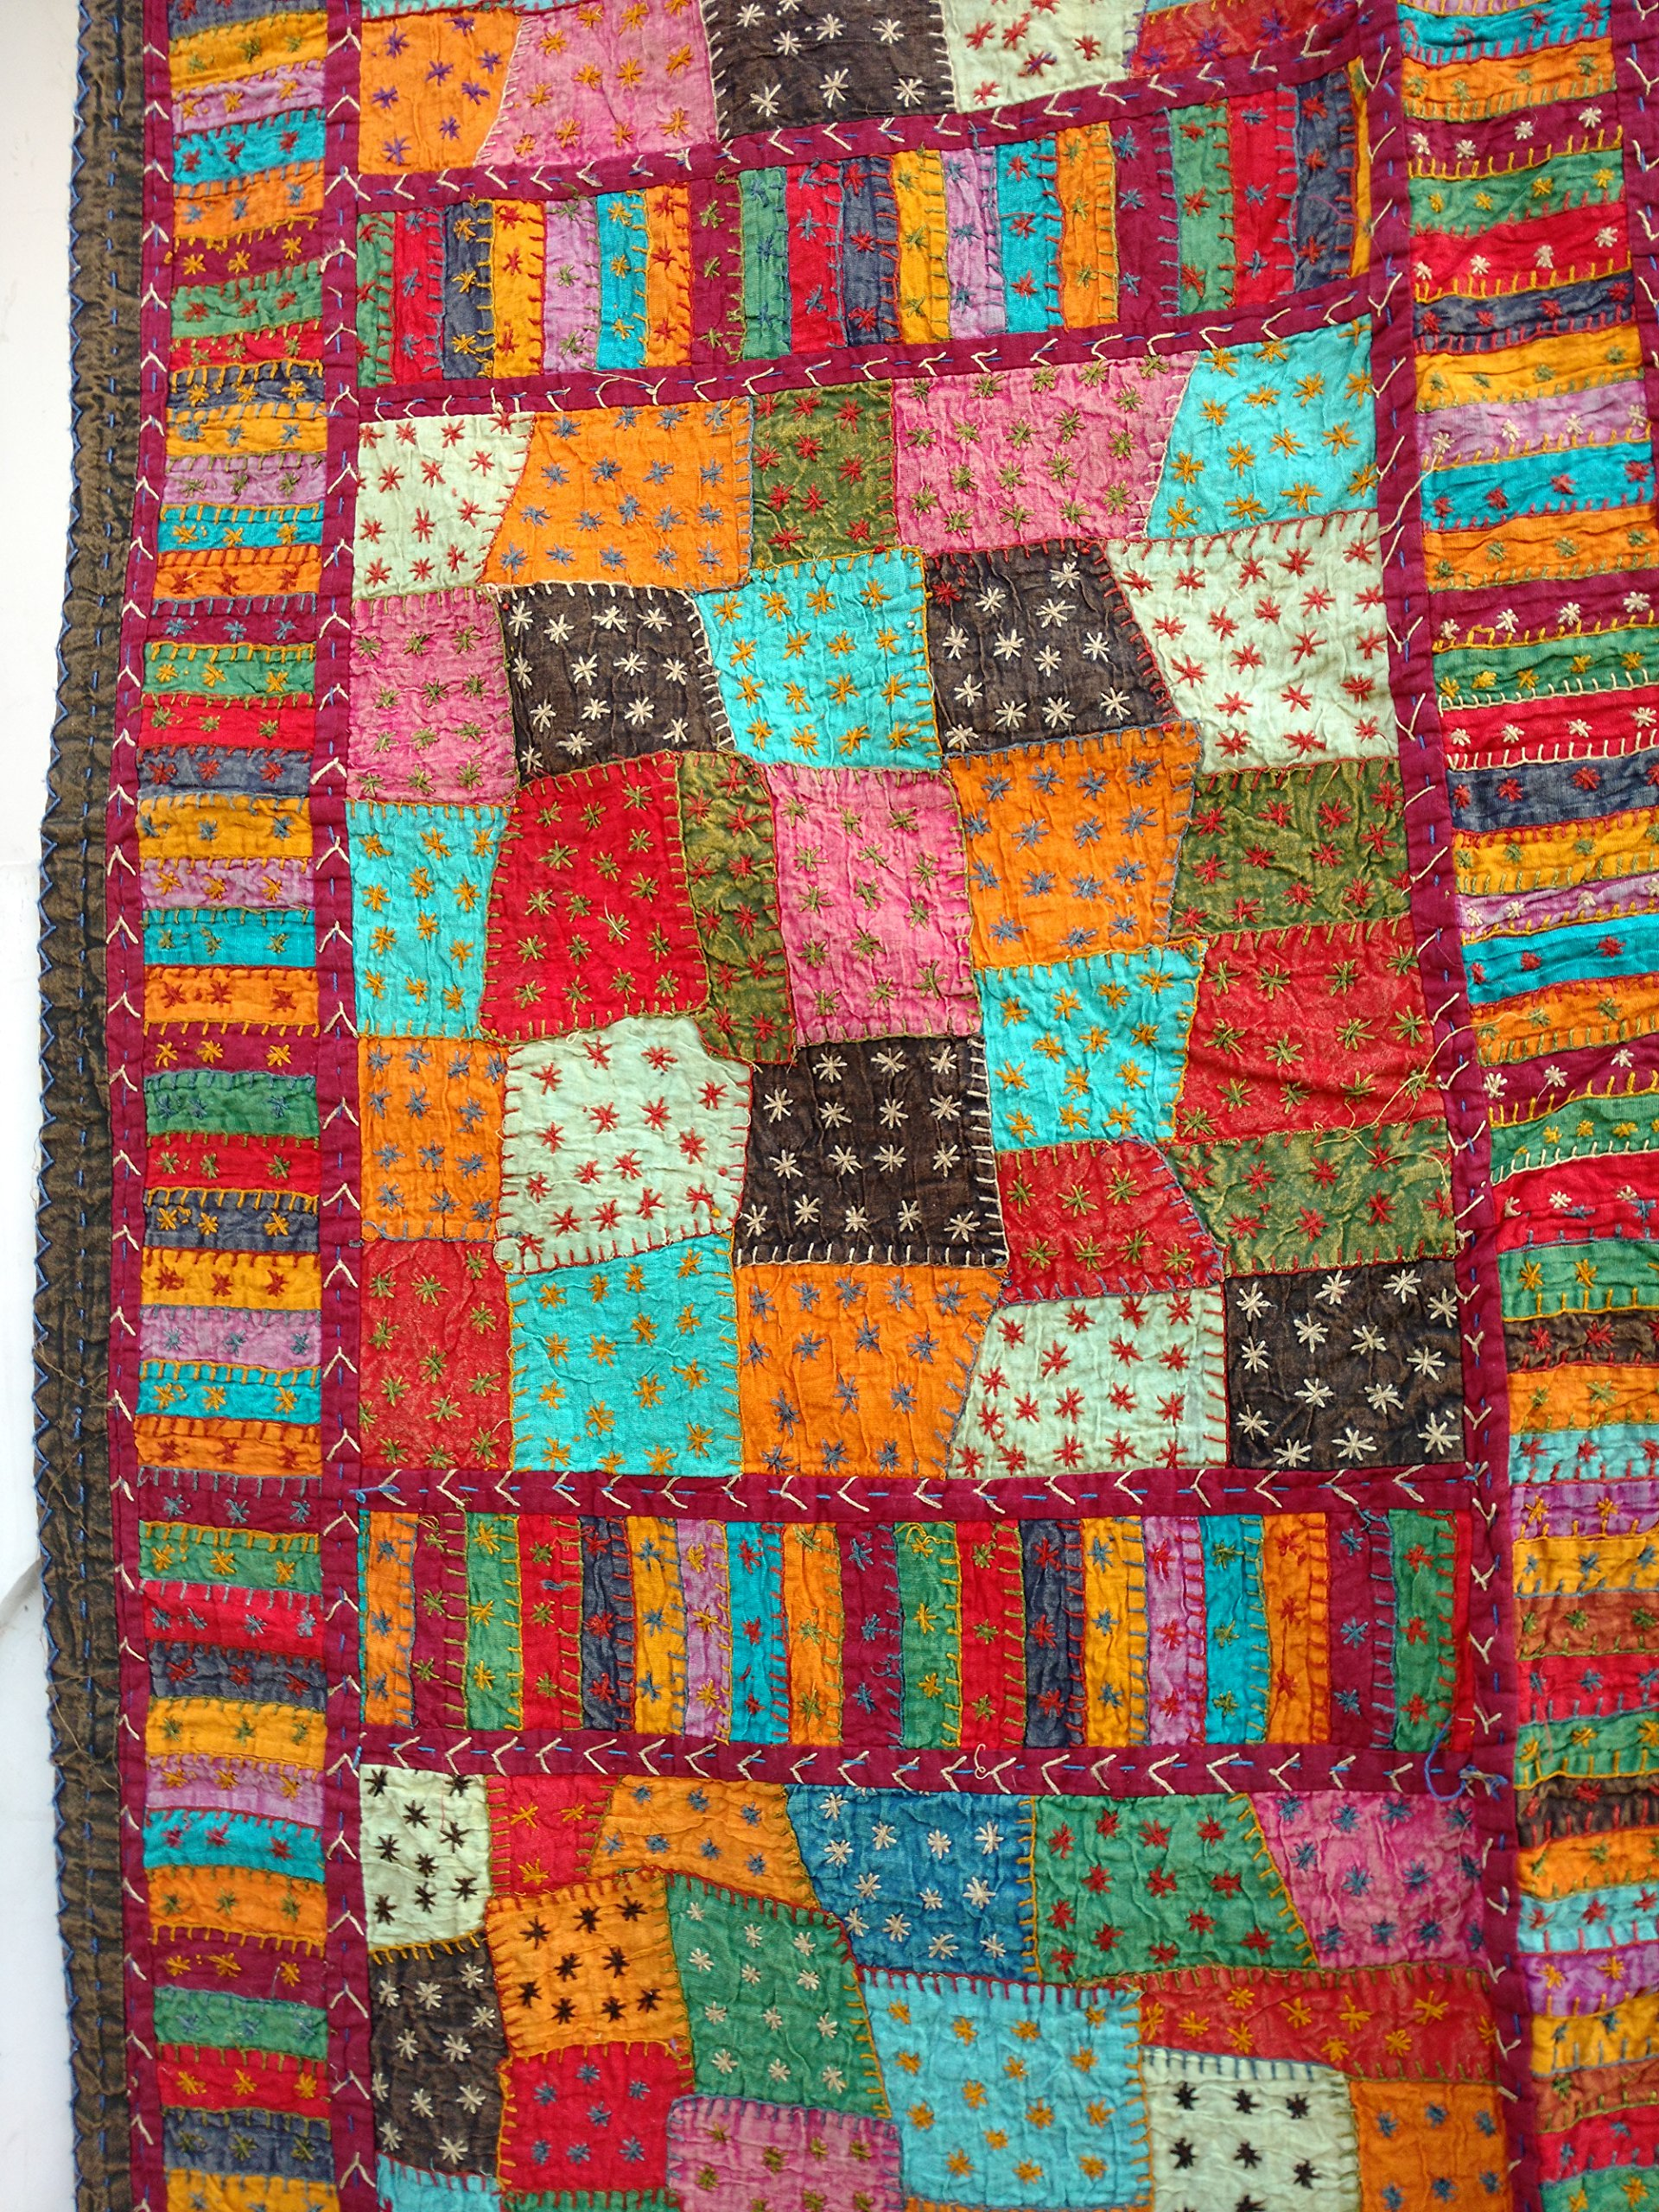 Rastogi Handicrafts India Ethnic Handmade Applique Jogi Work Cotton Double Bedcover Queen size Multi colored Bedsheet cover (MULTI COLOR 20 BOXES) by Rastogi Handicrafts (Image #3)